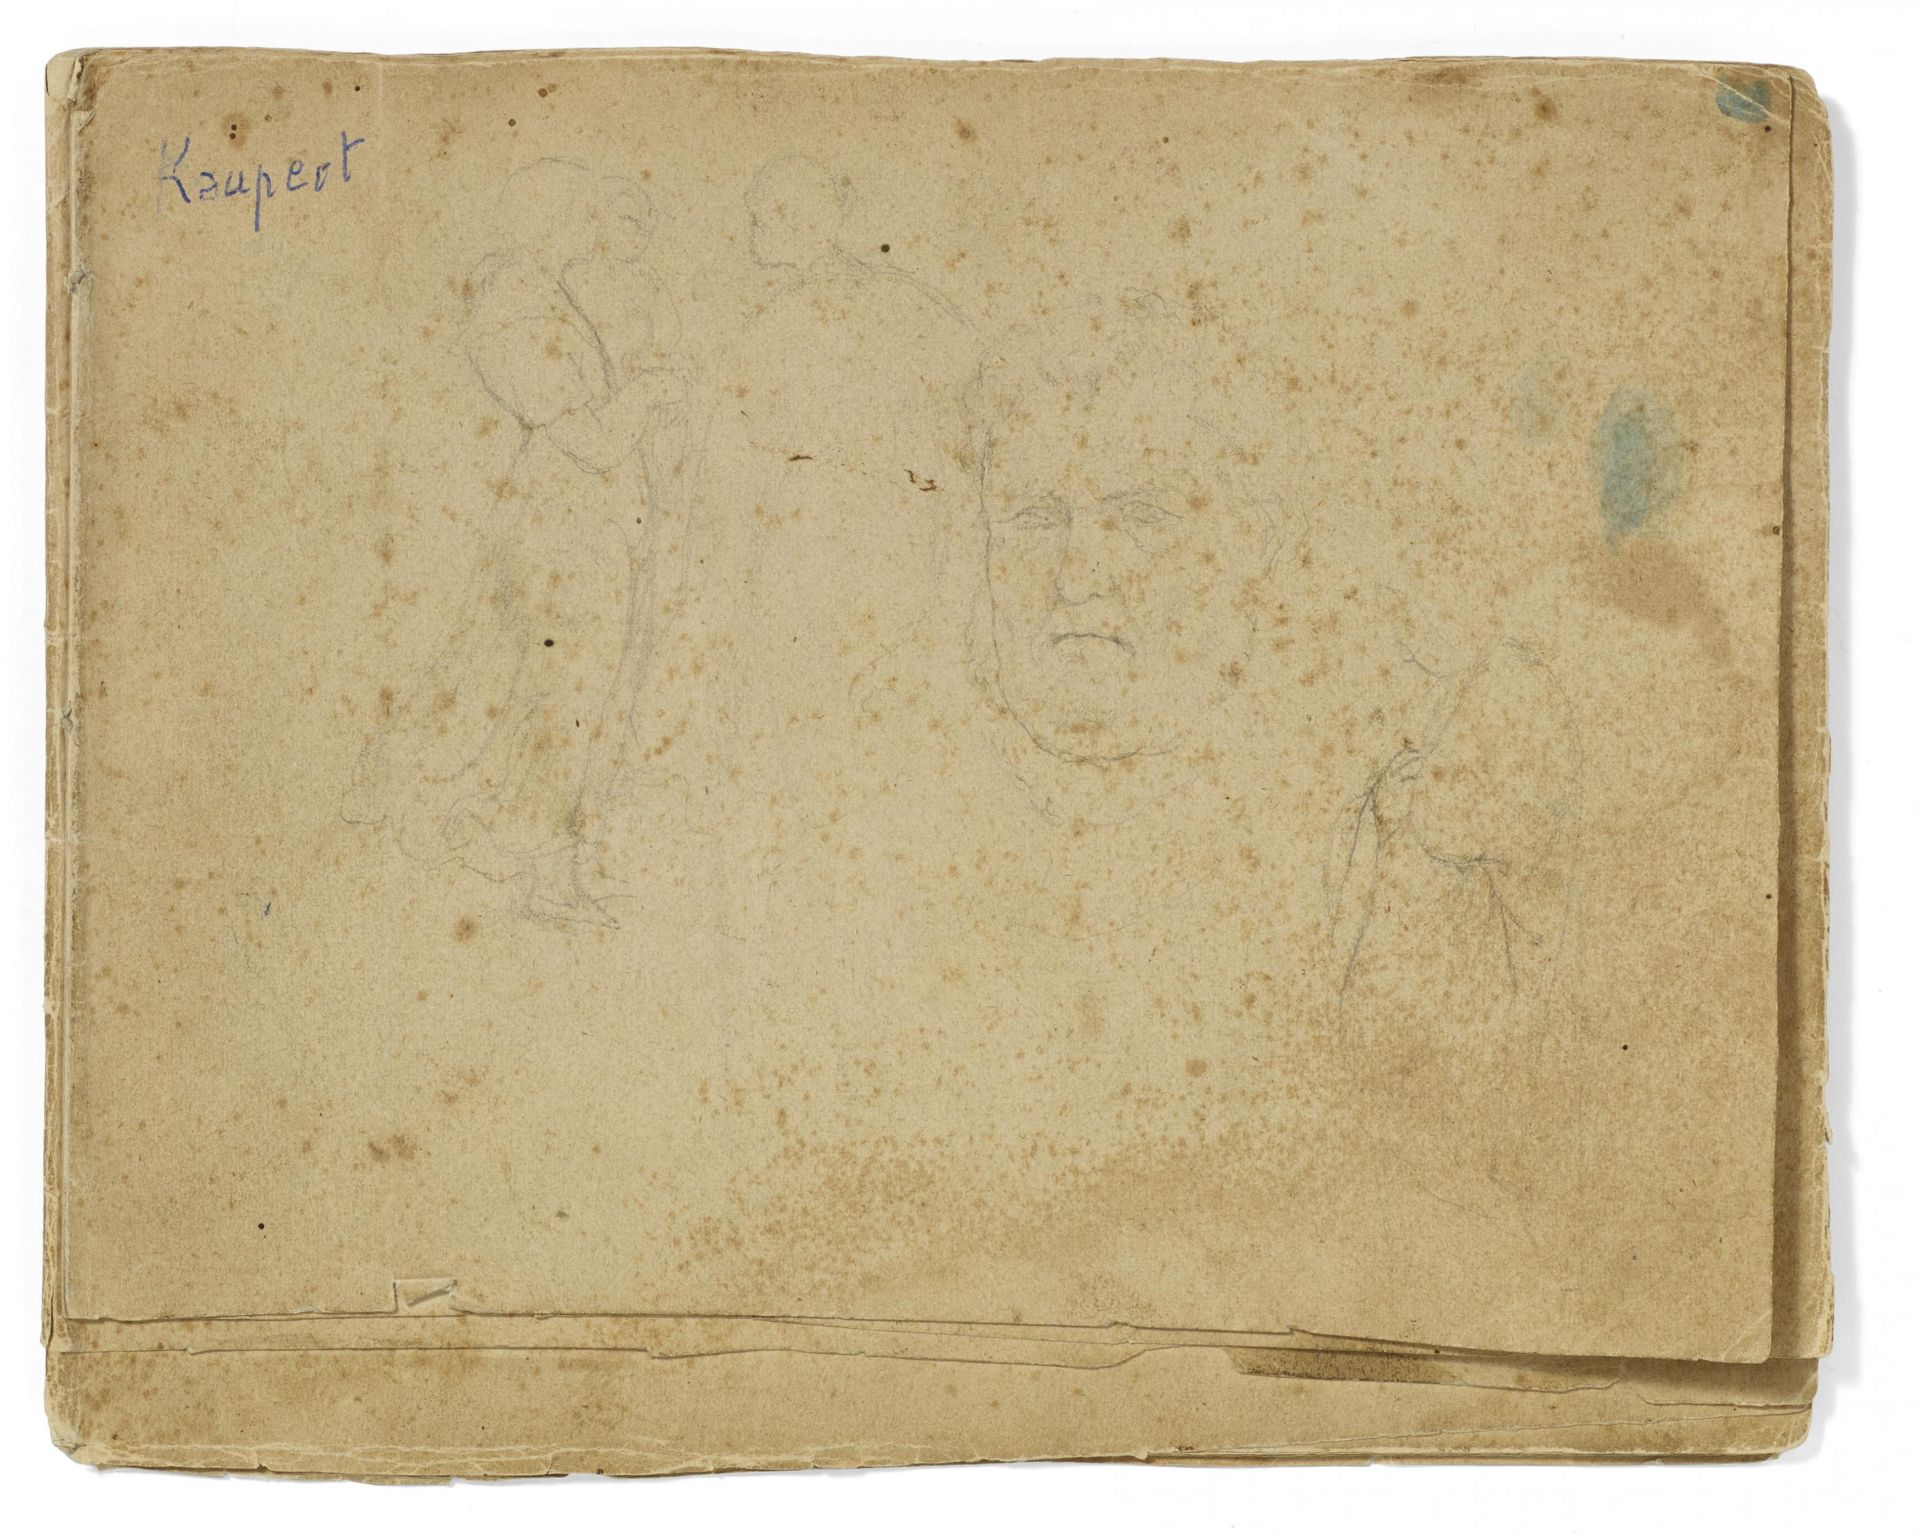 Kaupert, Gustav Kassel 1819 - 1897  Sketchbook, two booklets, each ca. 17 pages. Architectural - Bild 7 aus 8